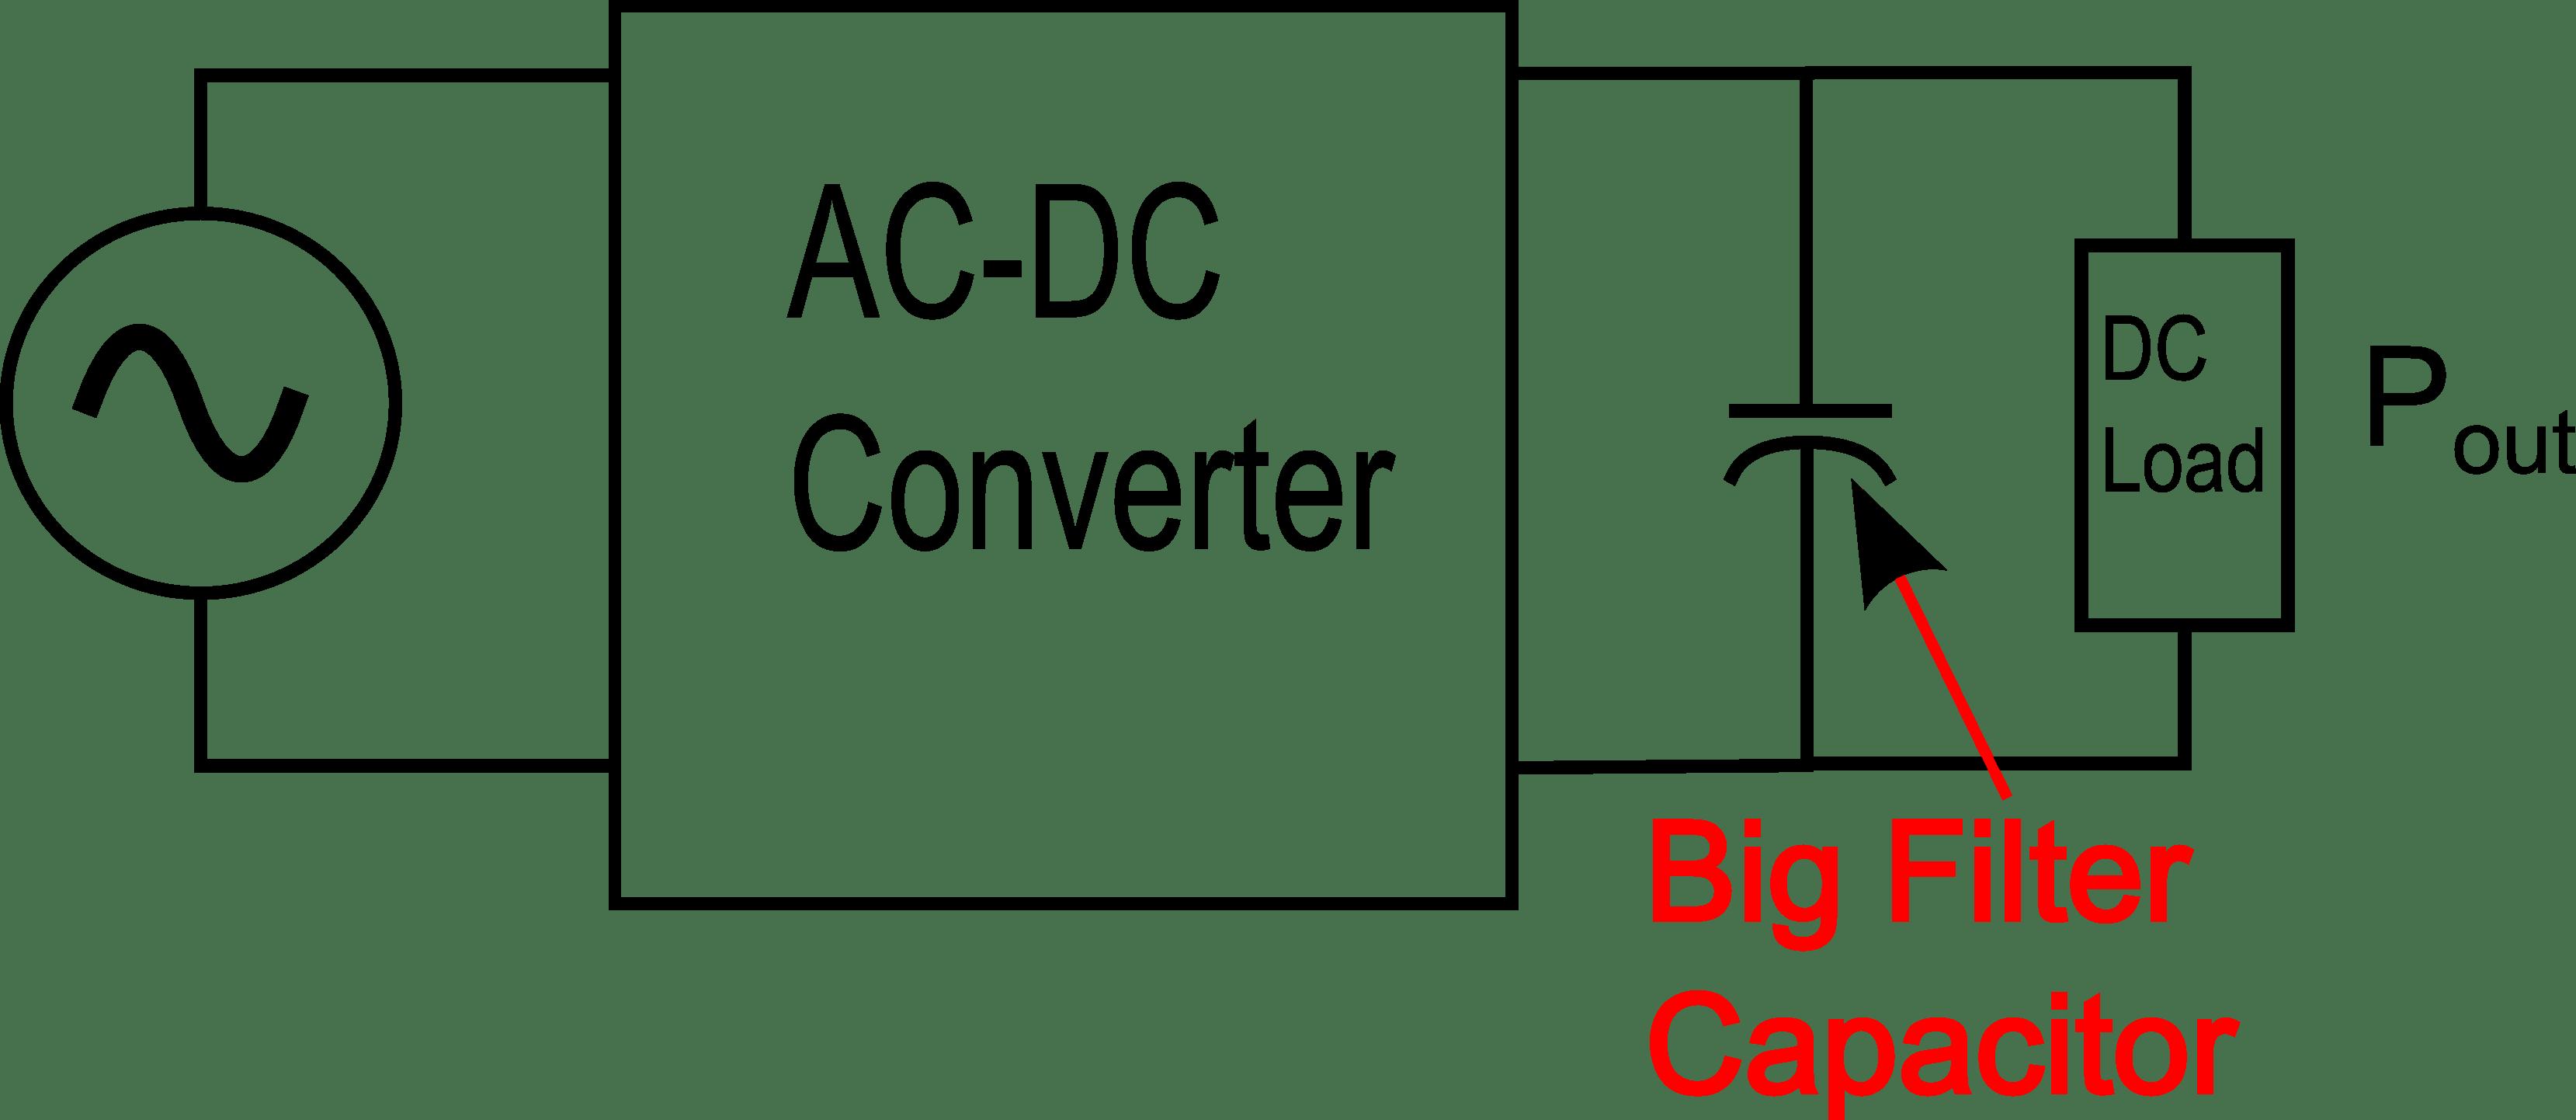 Ac Dc Voltage Converter Circuit